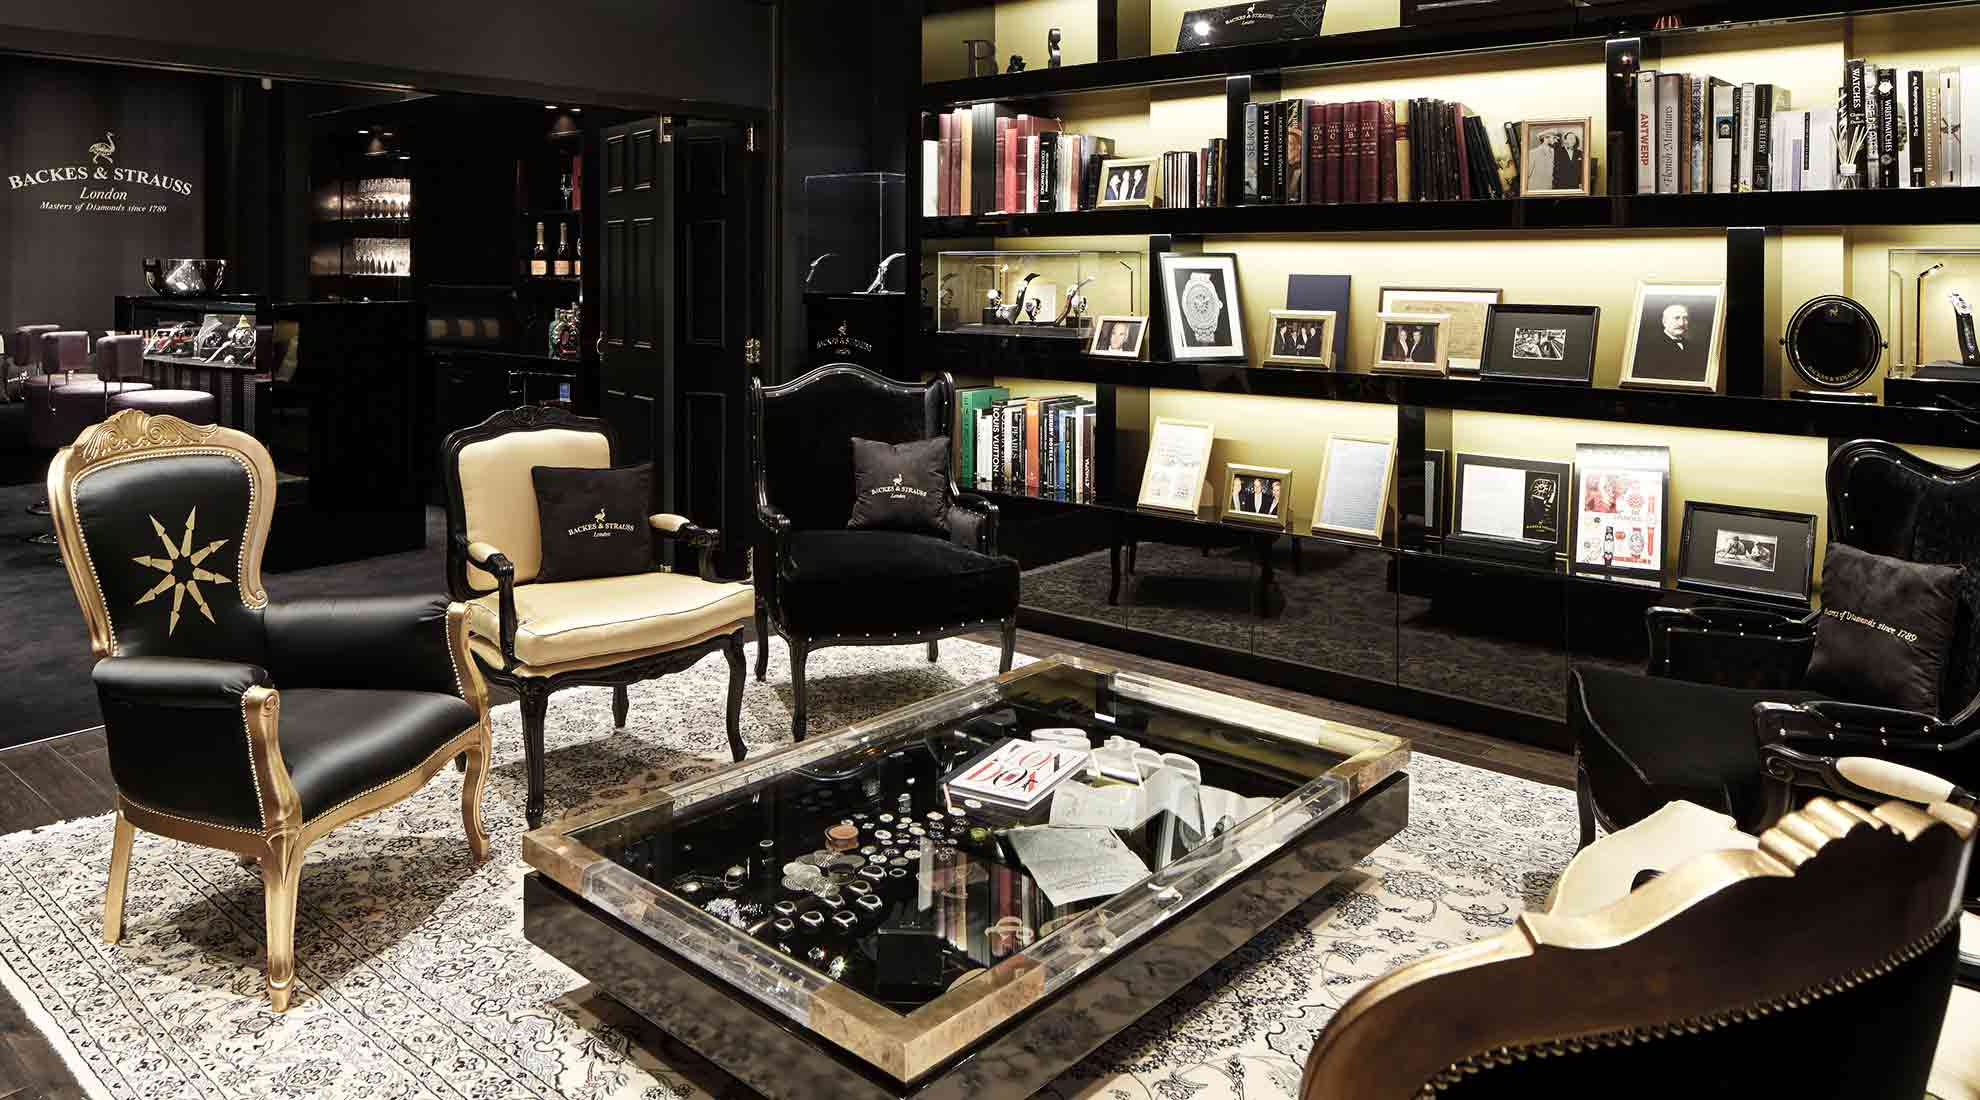 Backes & Strauss lounge